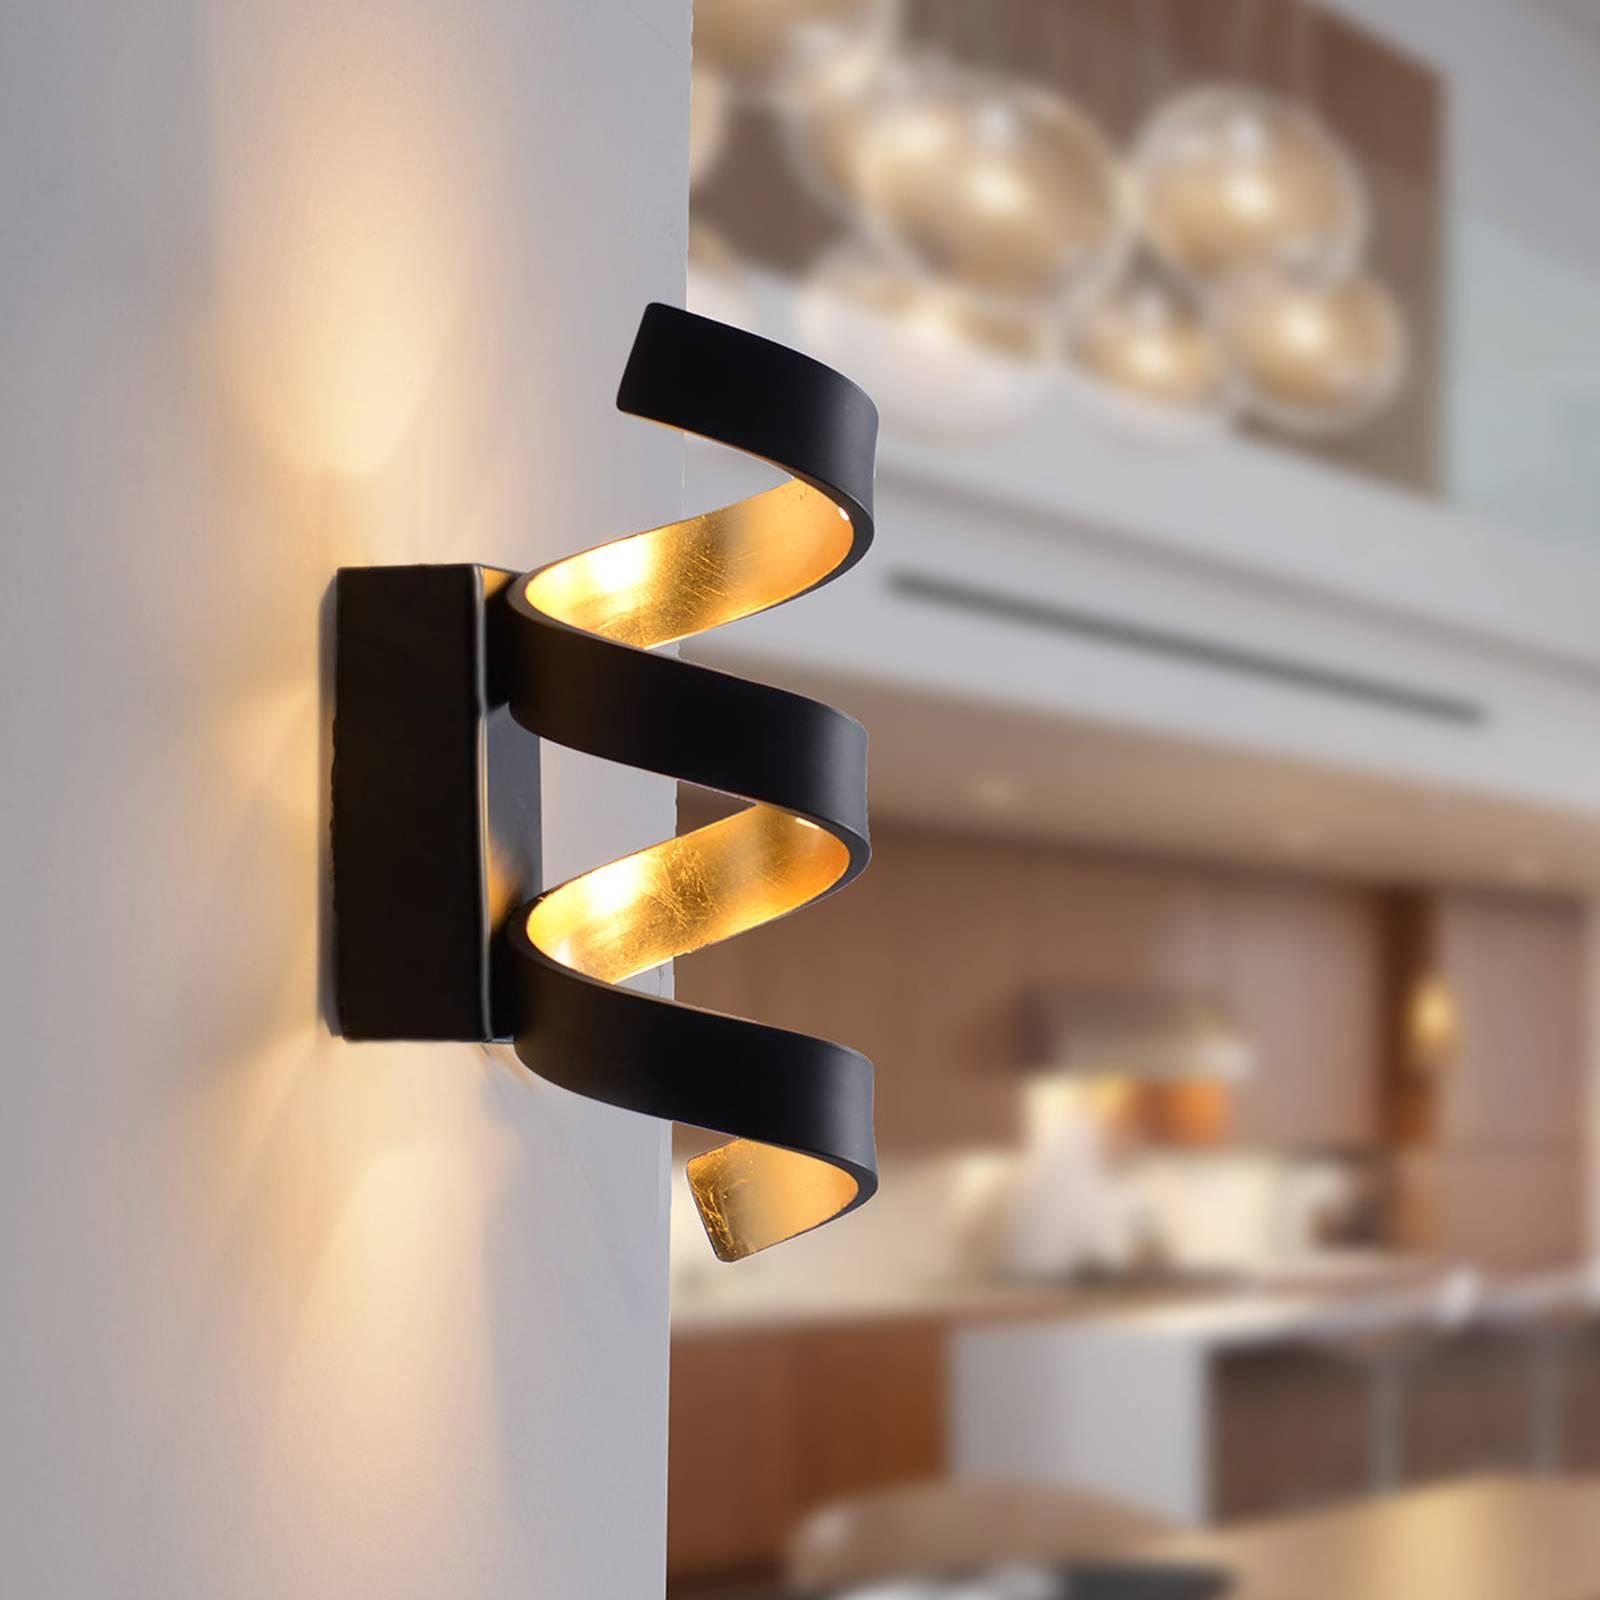 LED wandlamp Helix, zwart-goud, 26 cm